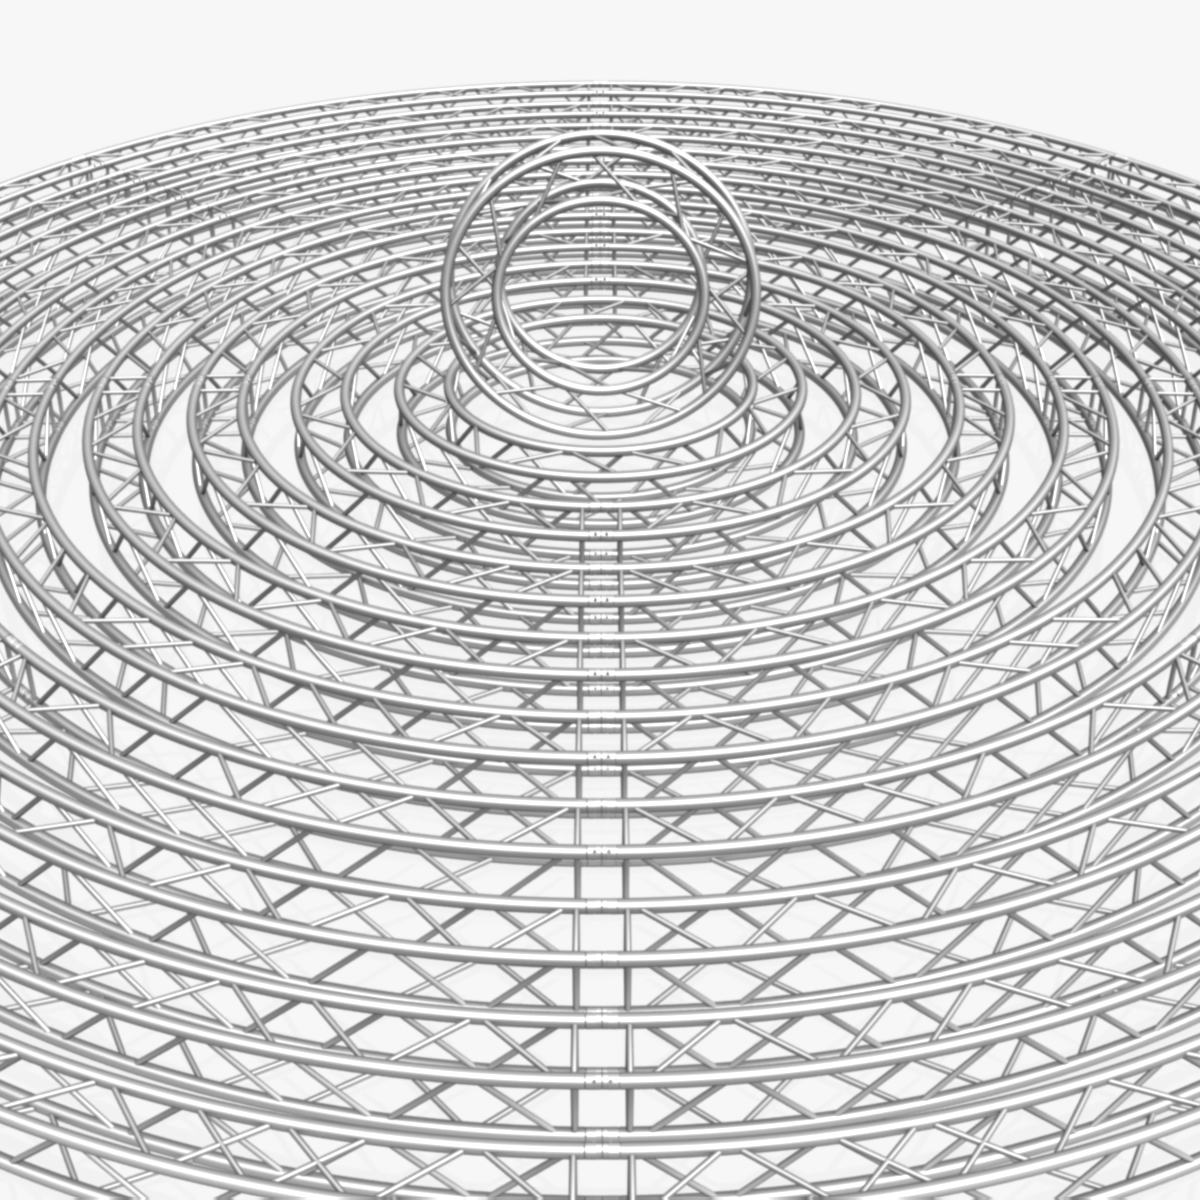 circle square truss modular collection 3d model 3ds max dxf fbx c4d dae  texture obj 252332